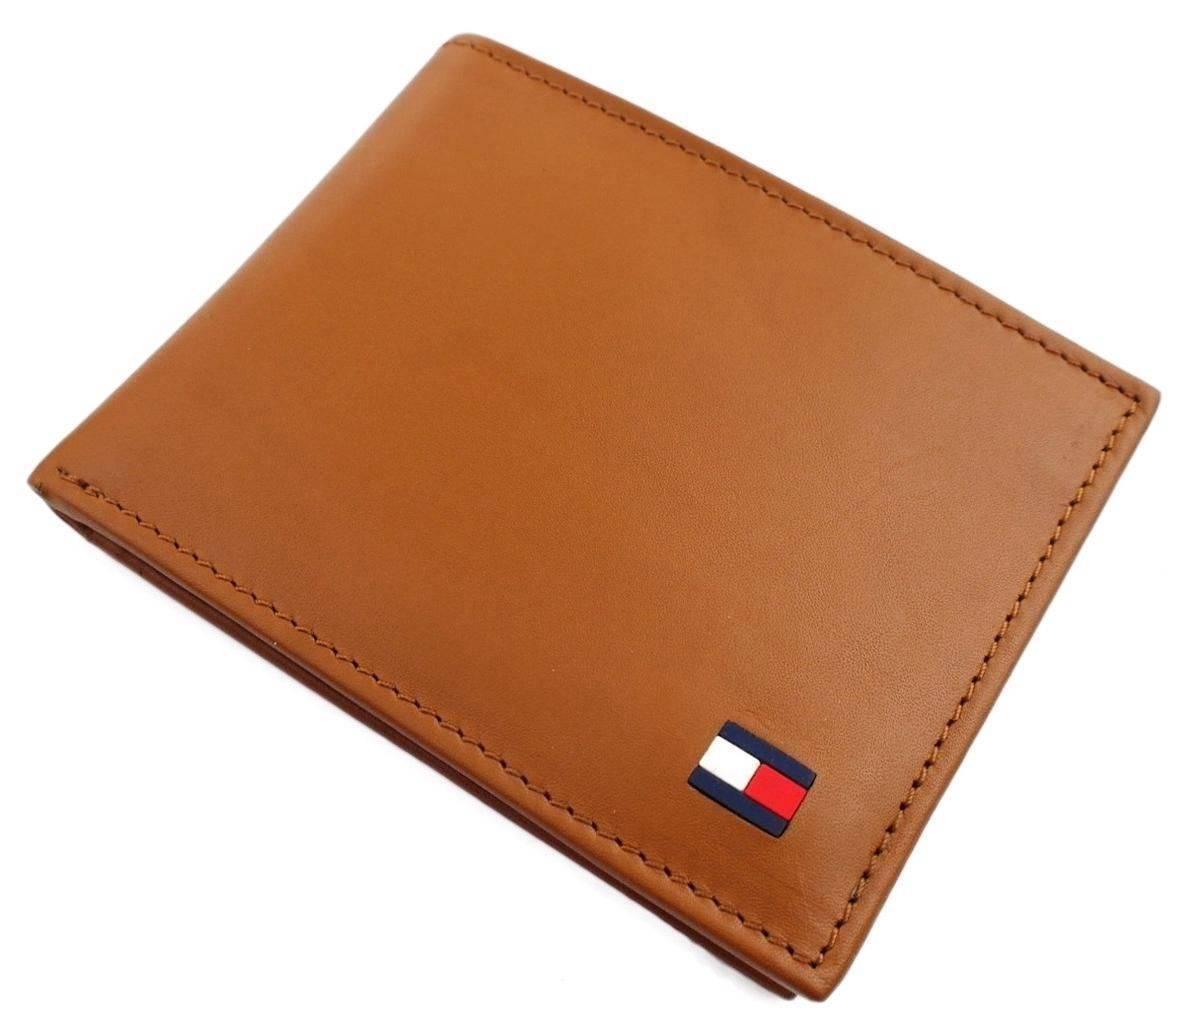 Tommy-Hilfiger-Men-039-s-Premium-Leather-Credit-Card-ID-Wallet-Passcase-31TL22X046 thumbnail 37